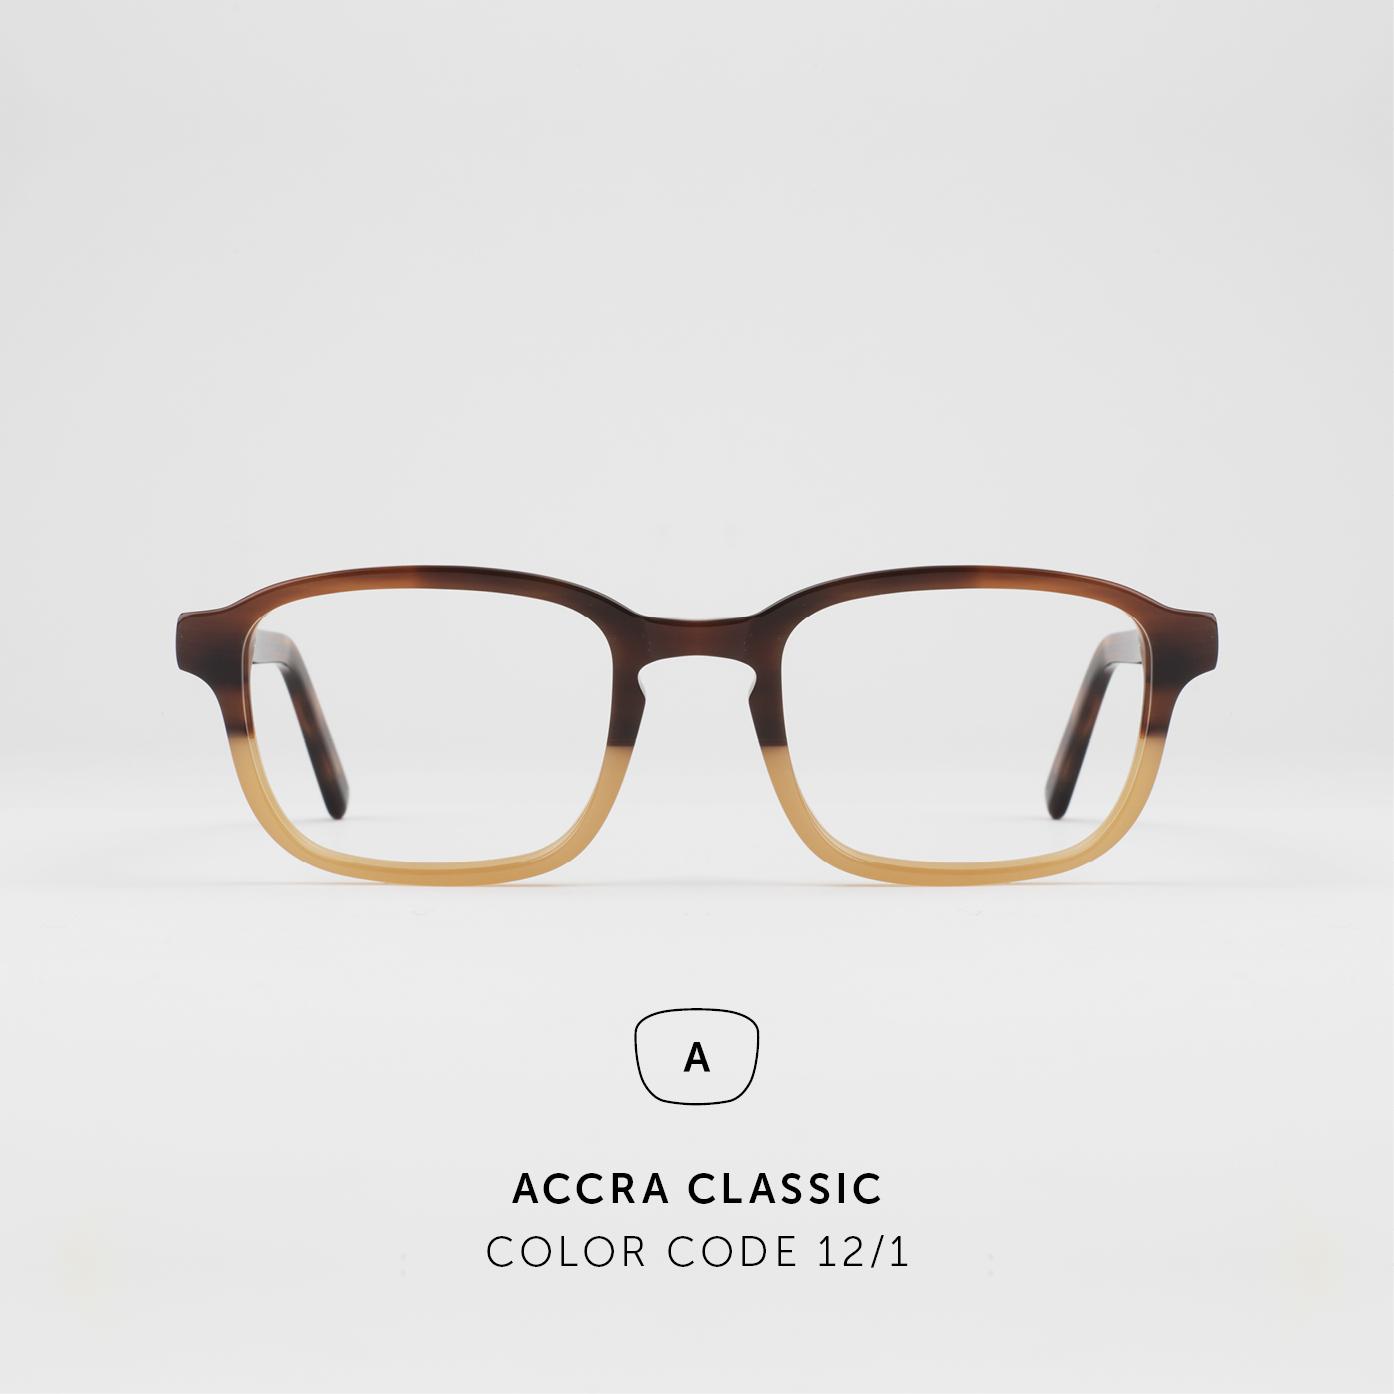 AccraClassic37.jpg